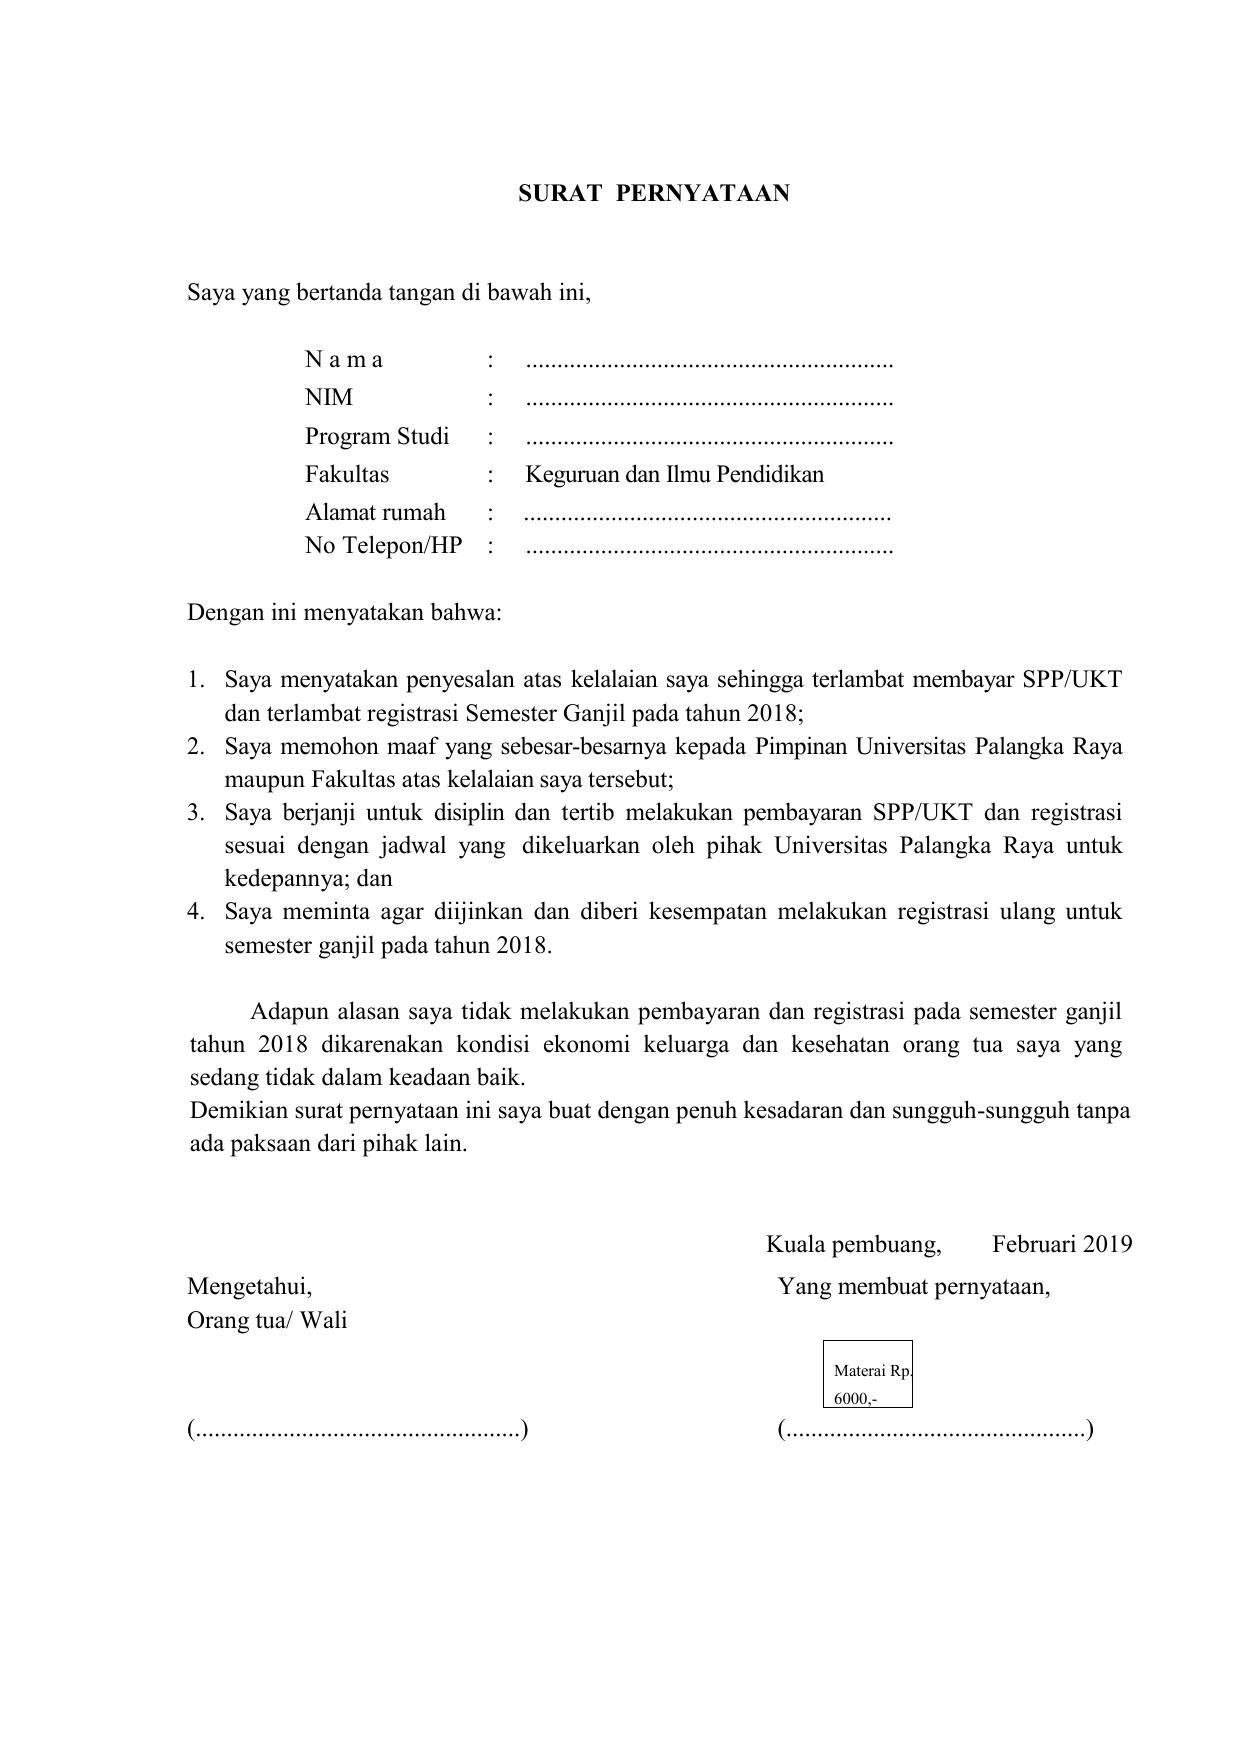 surat-pernyataan-telat-bayar-spp-bop-ukt-krs1